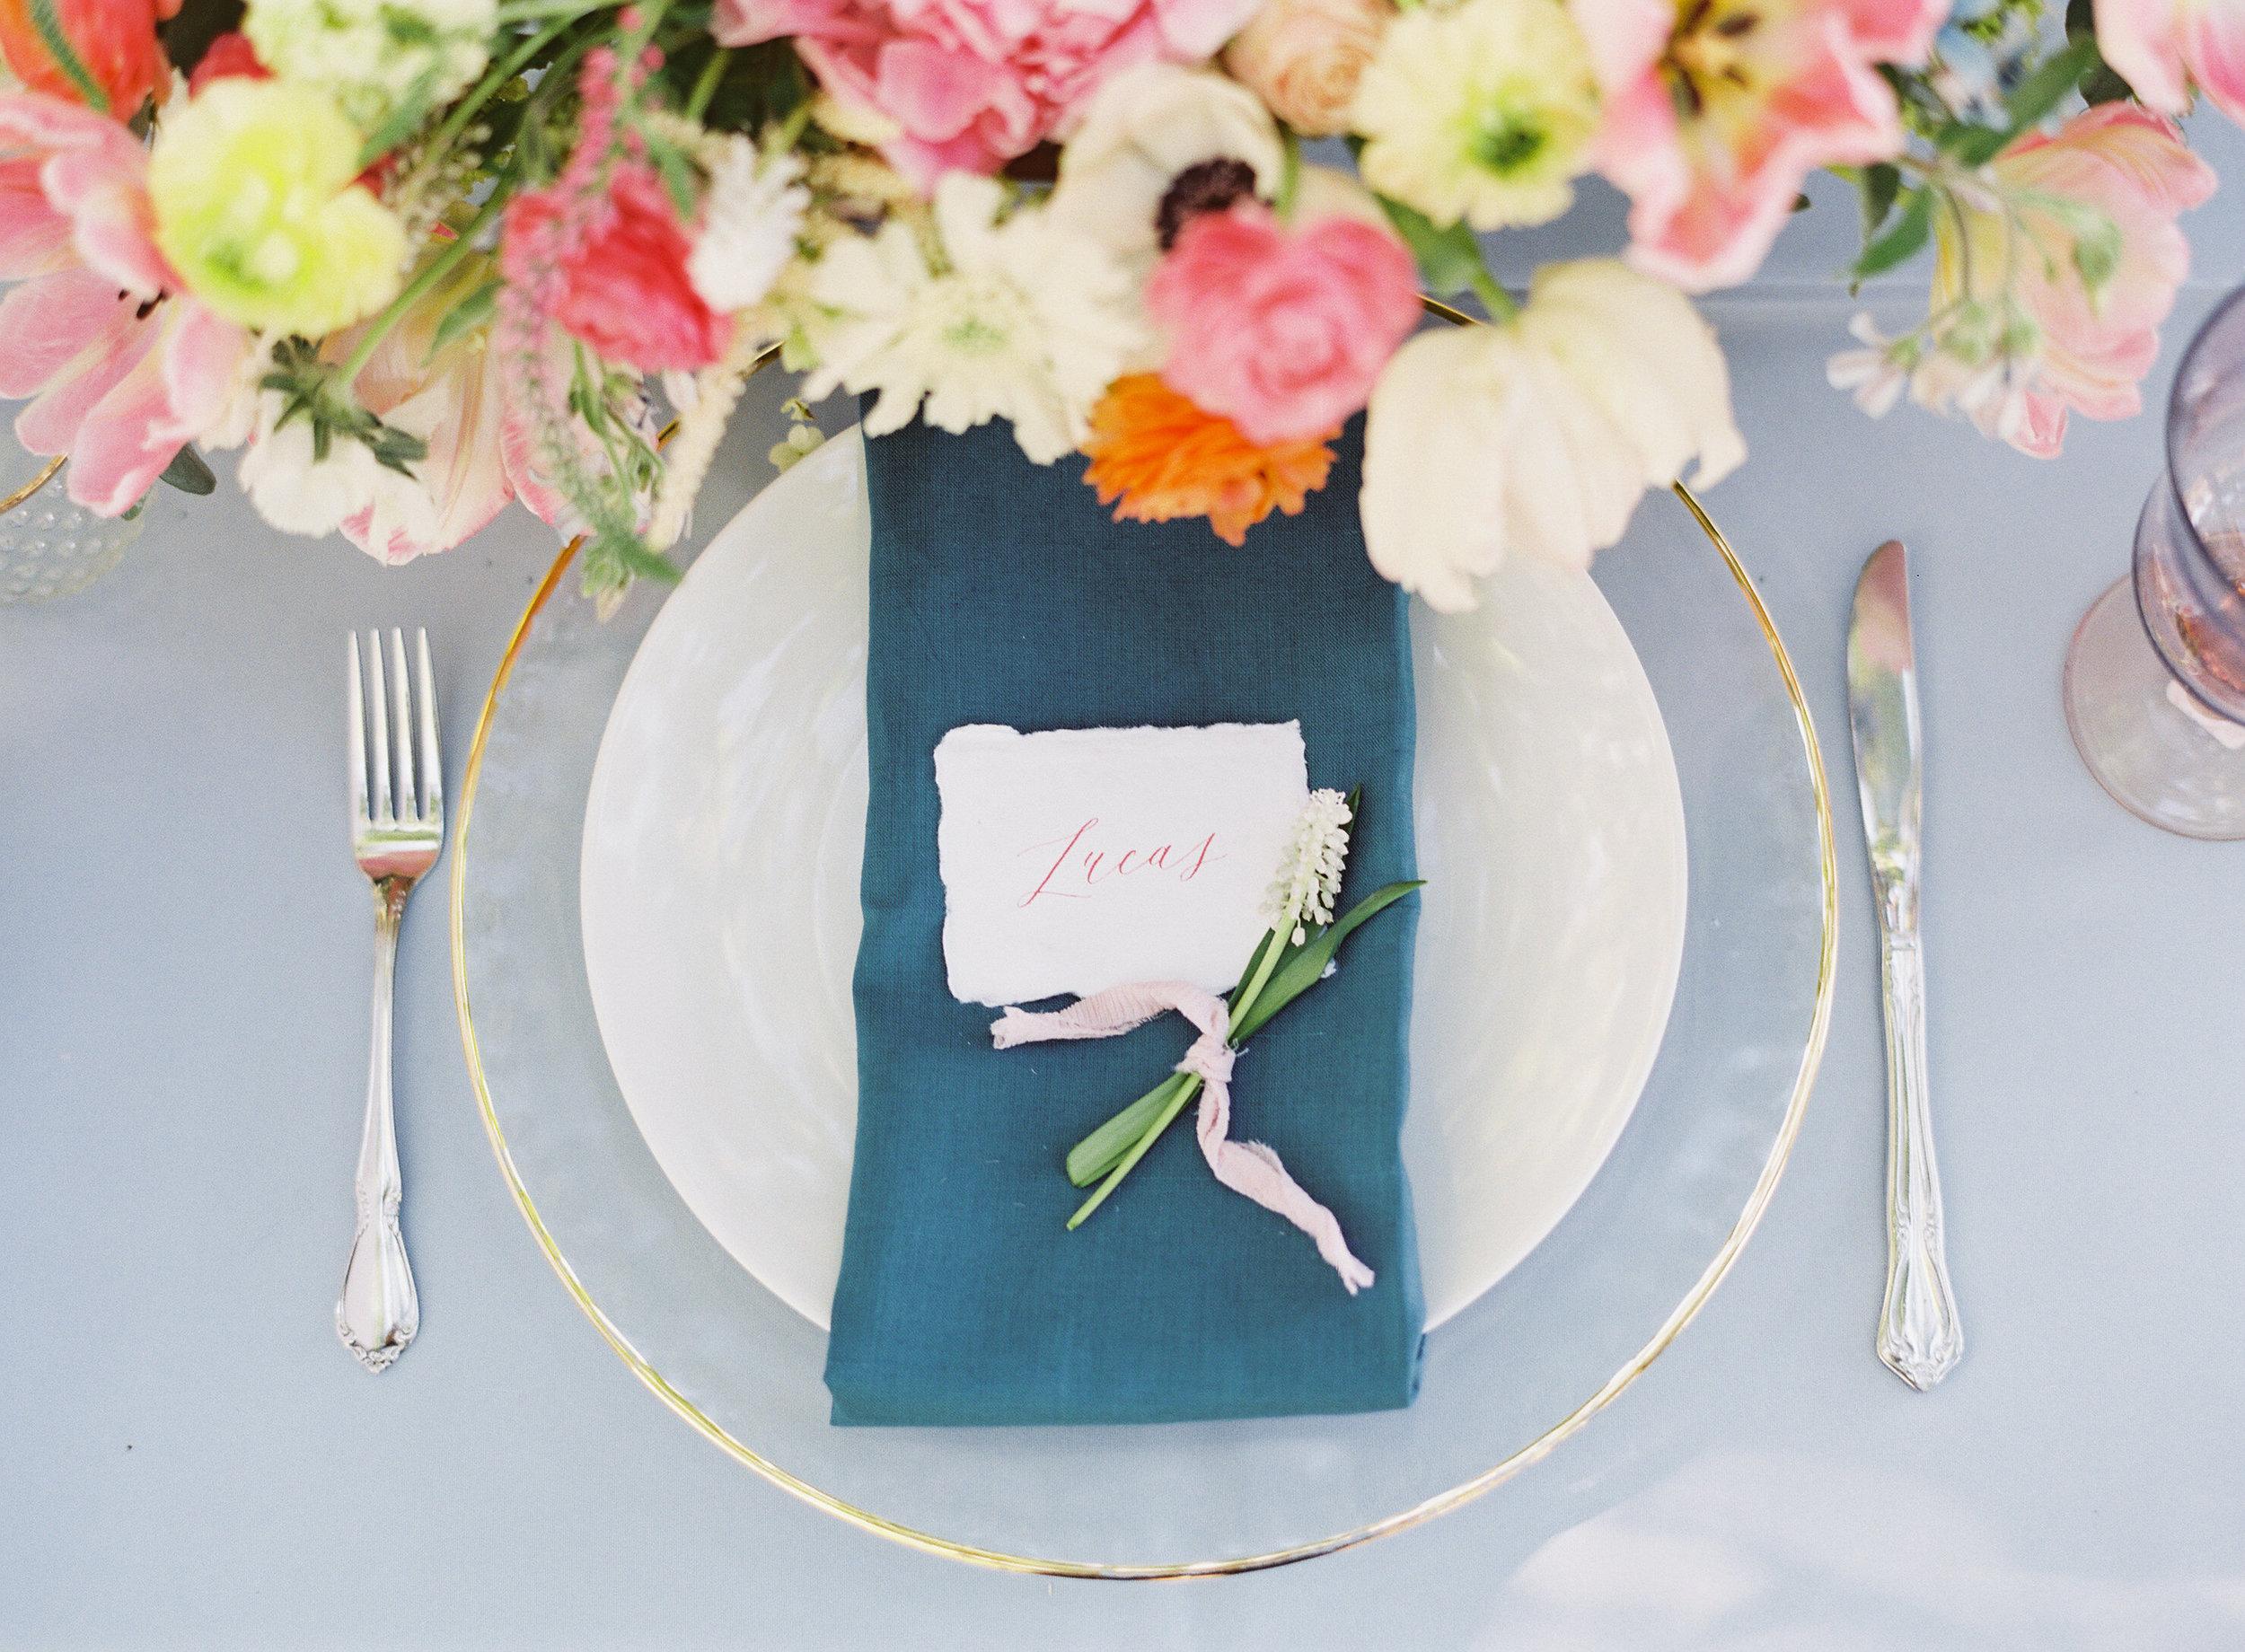 NathalieCheng_Monet_Styled_Shoot_Table_040.jpg